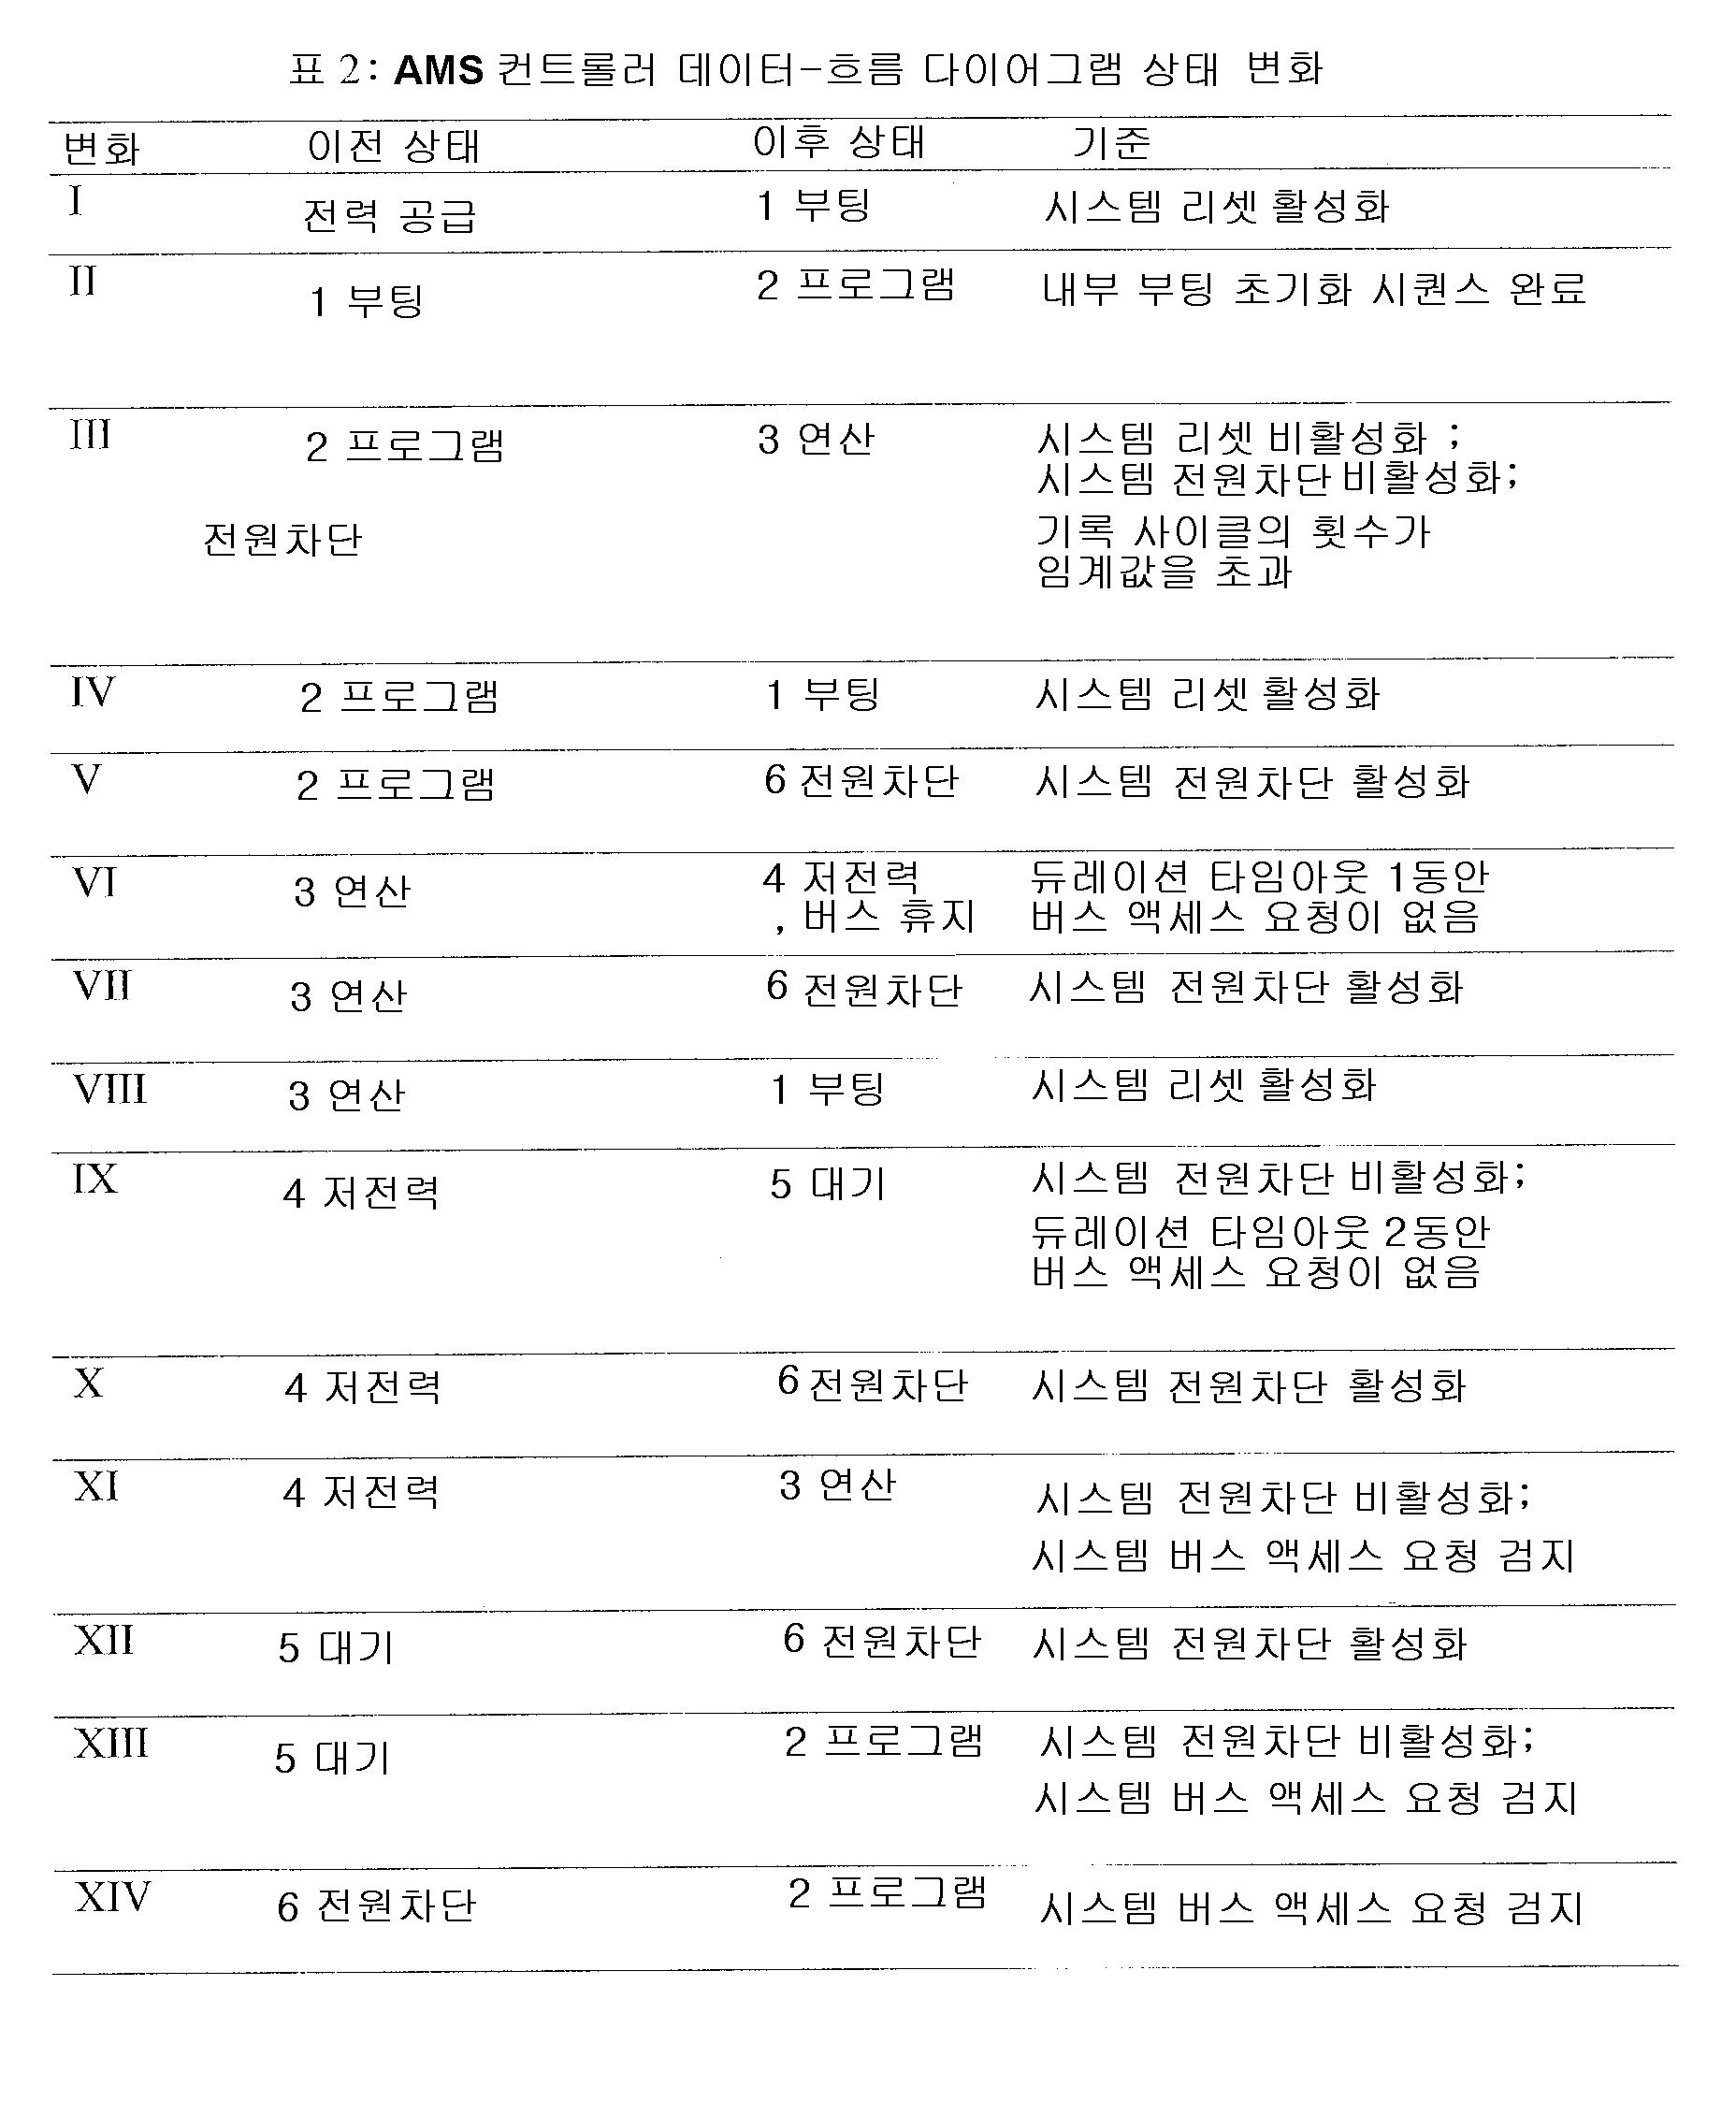 Figure 112013002161165-pct00012